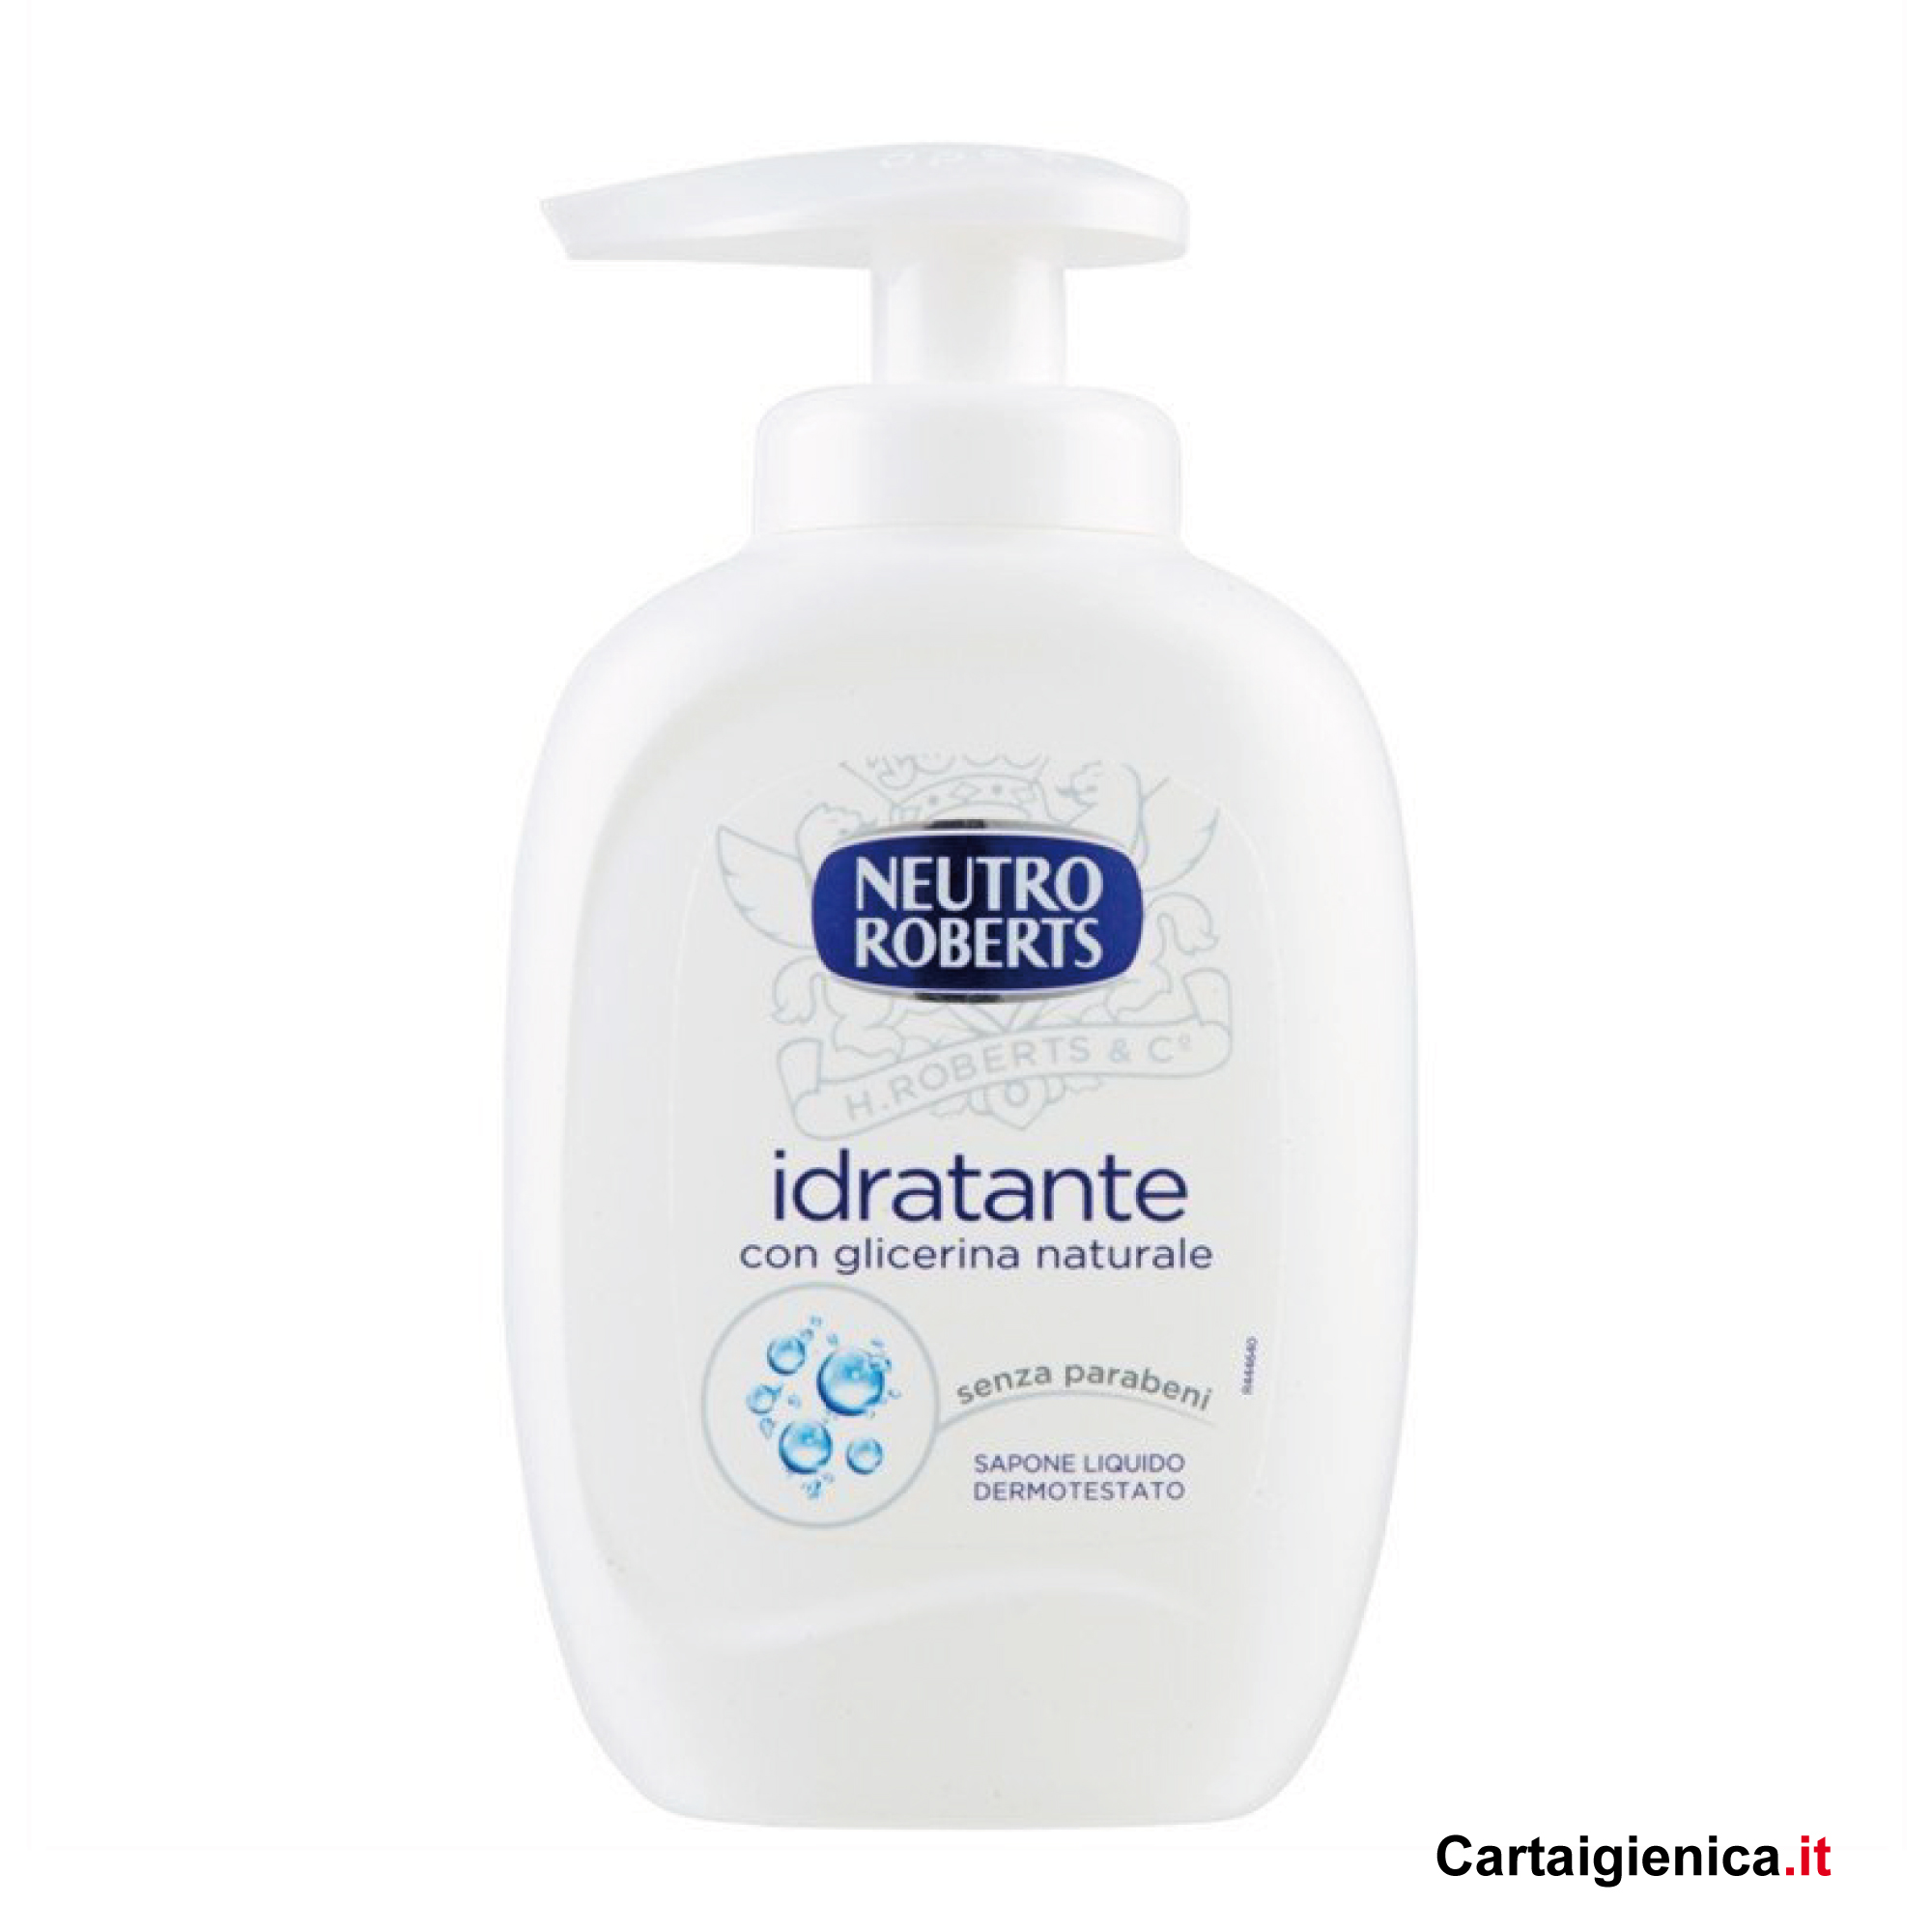 neutro roberts sapone liquido idratante 300 ml